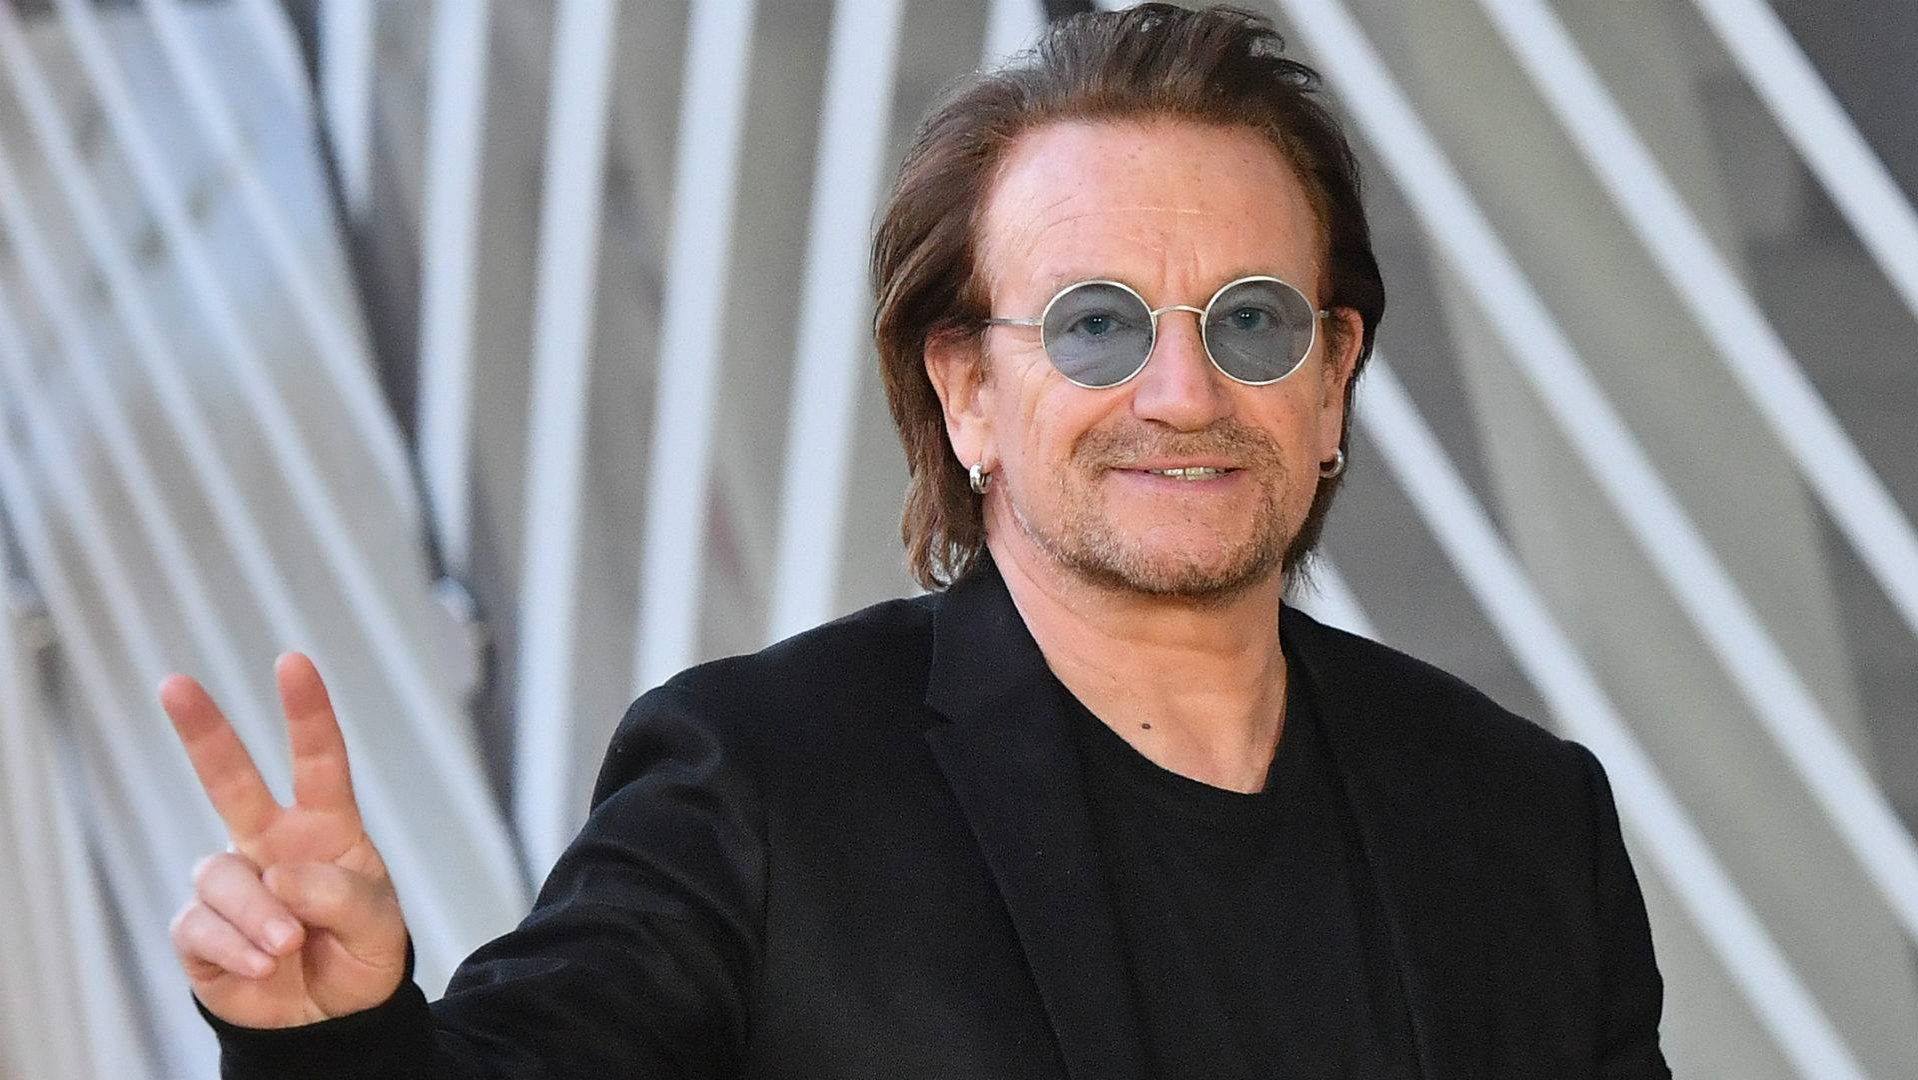 Bono Vox, foto: Getty Images